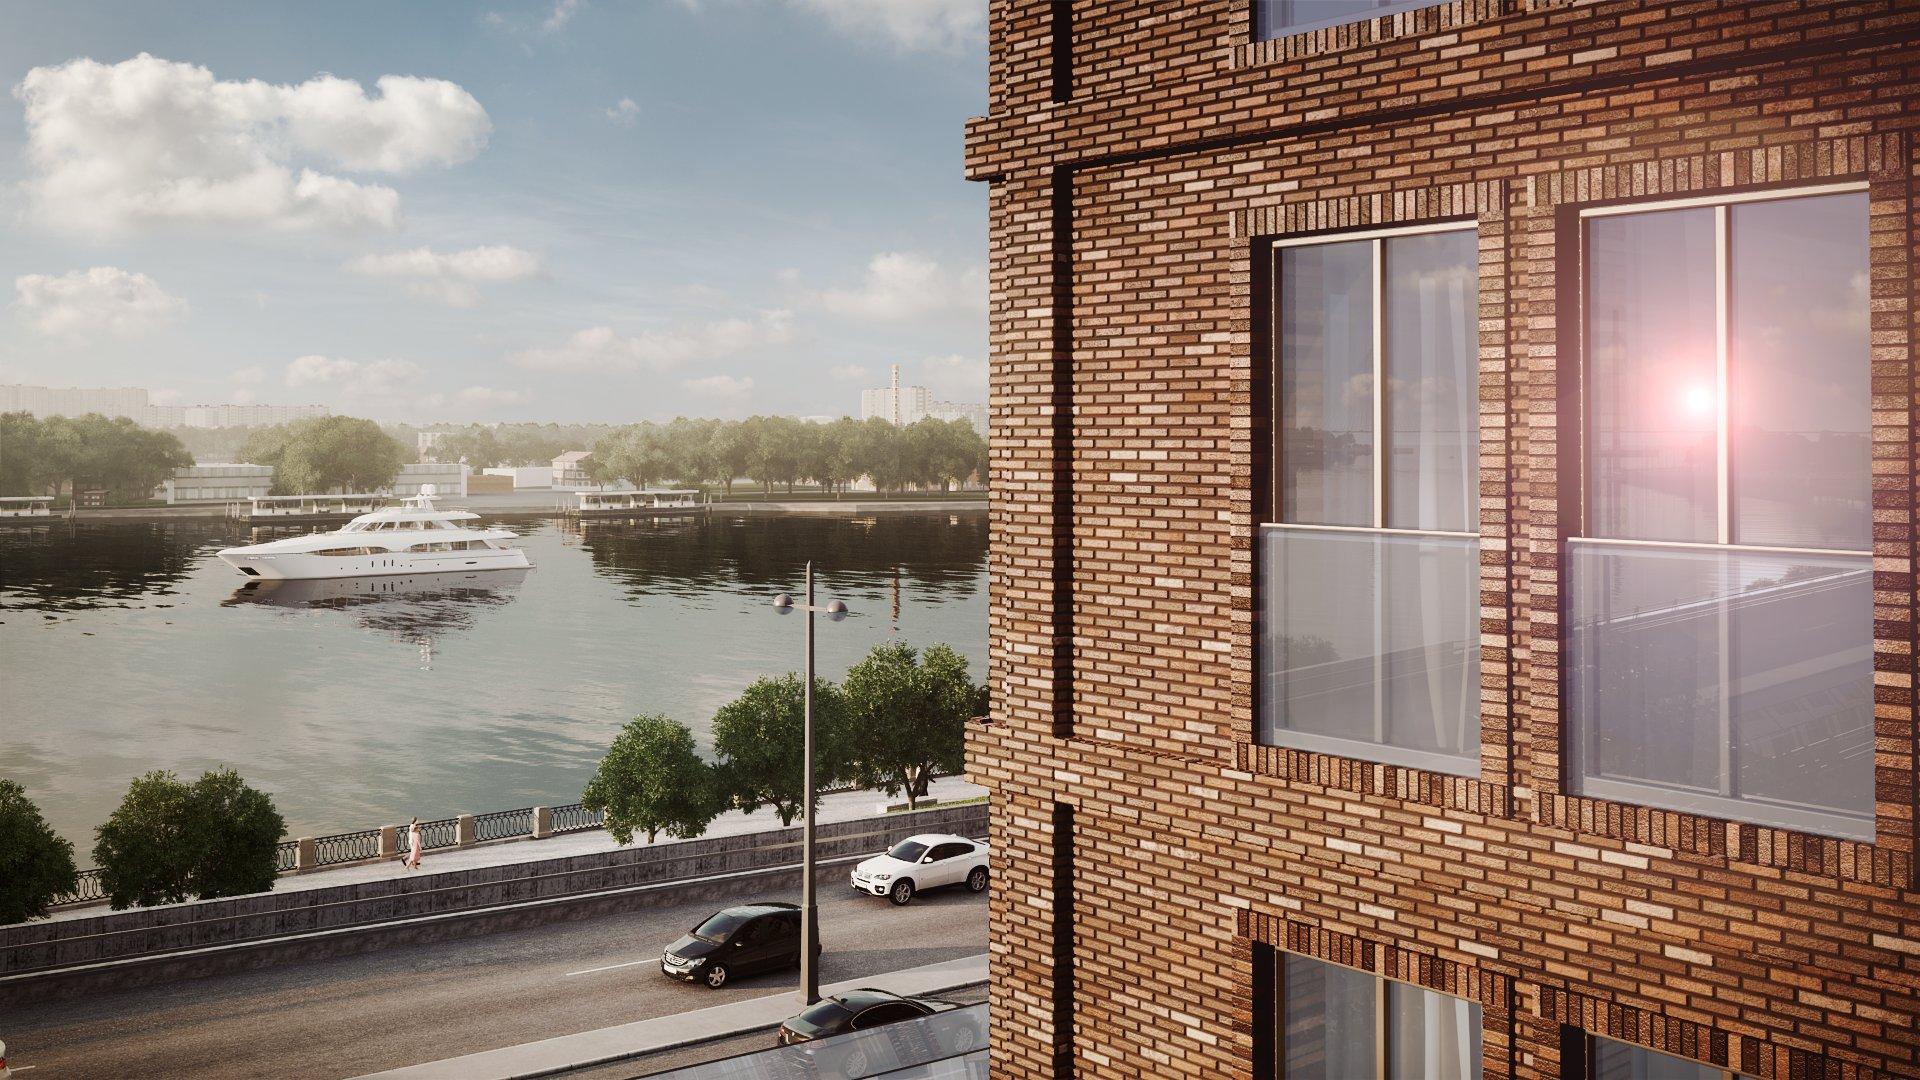 Лофт-квартал Docklands